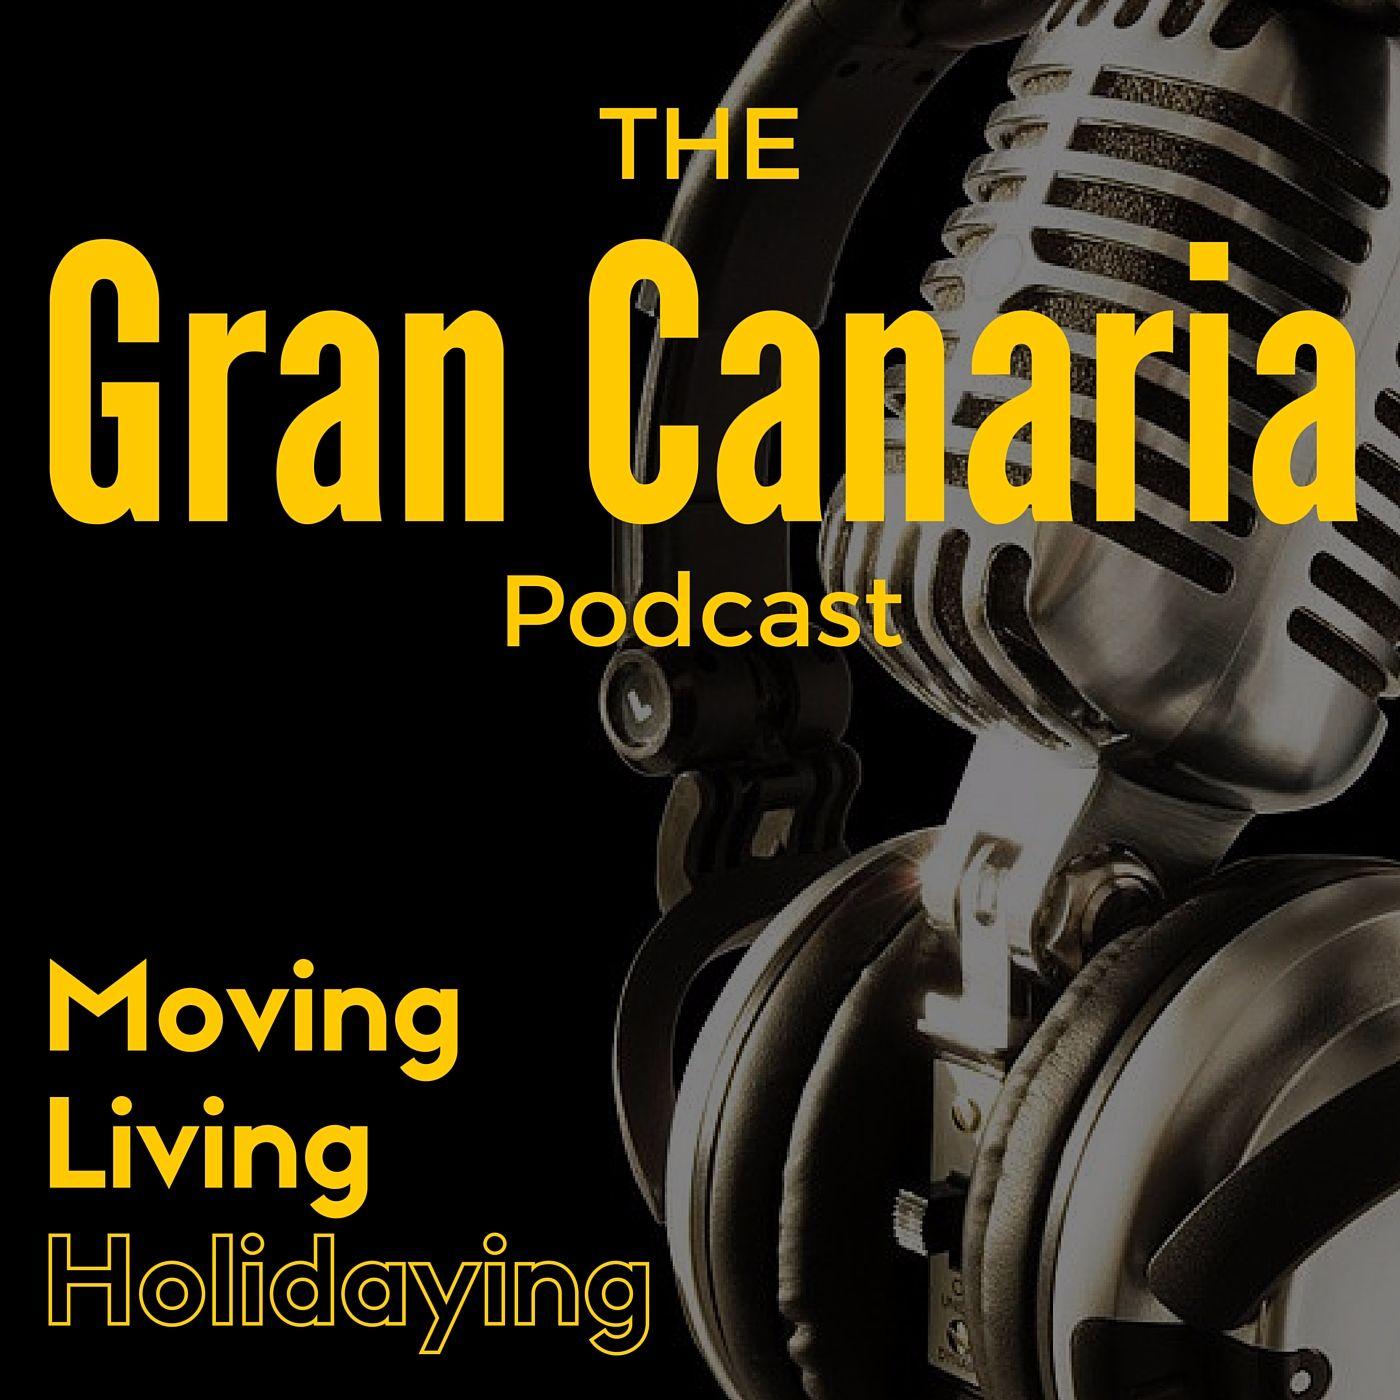 Adventure Gran Canaria